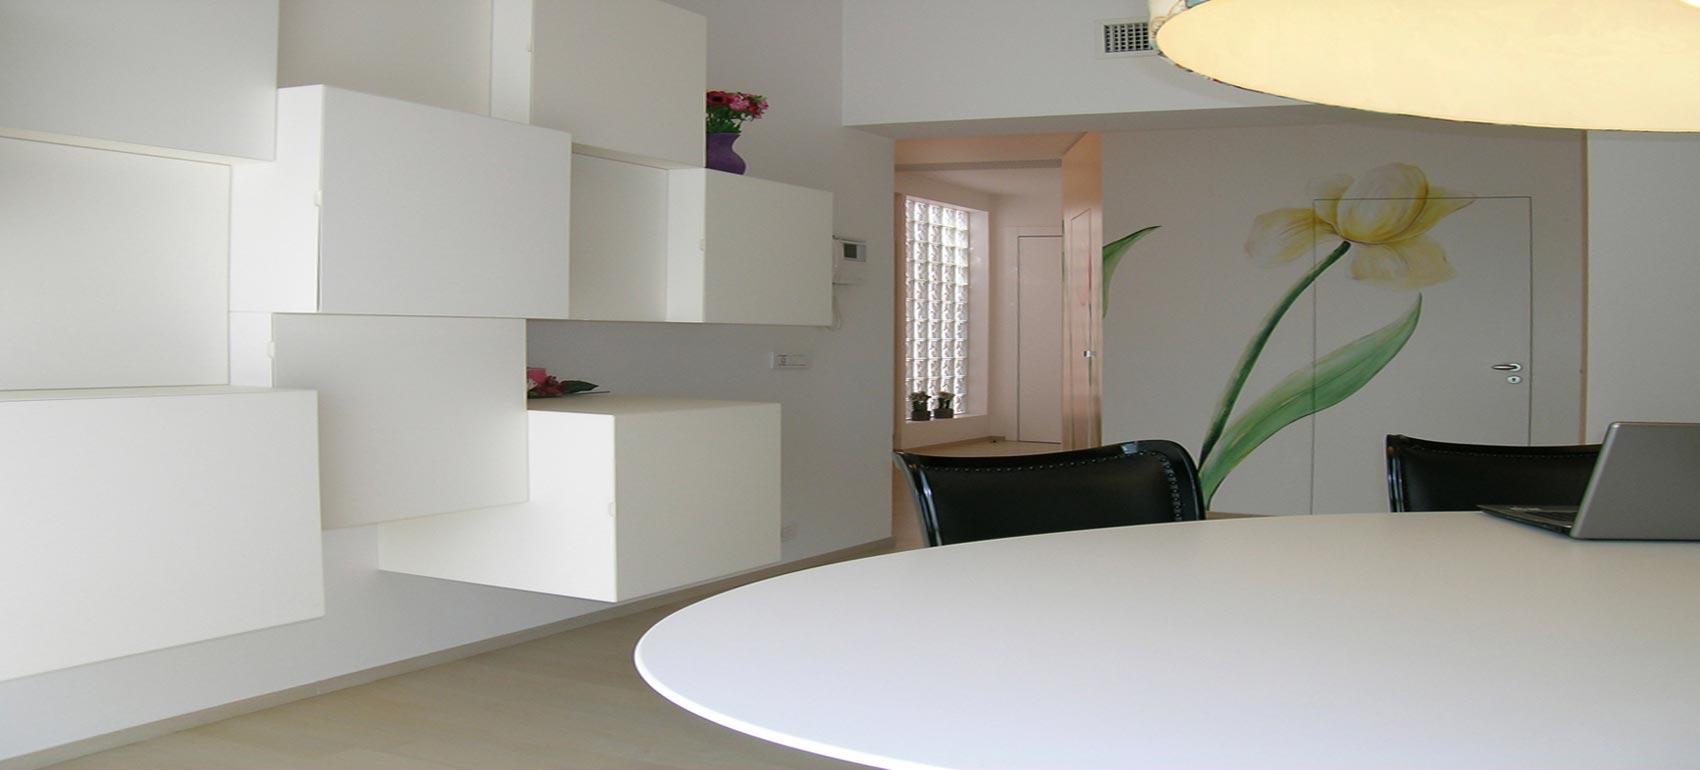 stefanoturi-architetto_residenzaprivata3_1